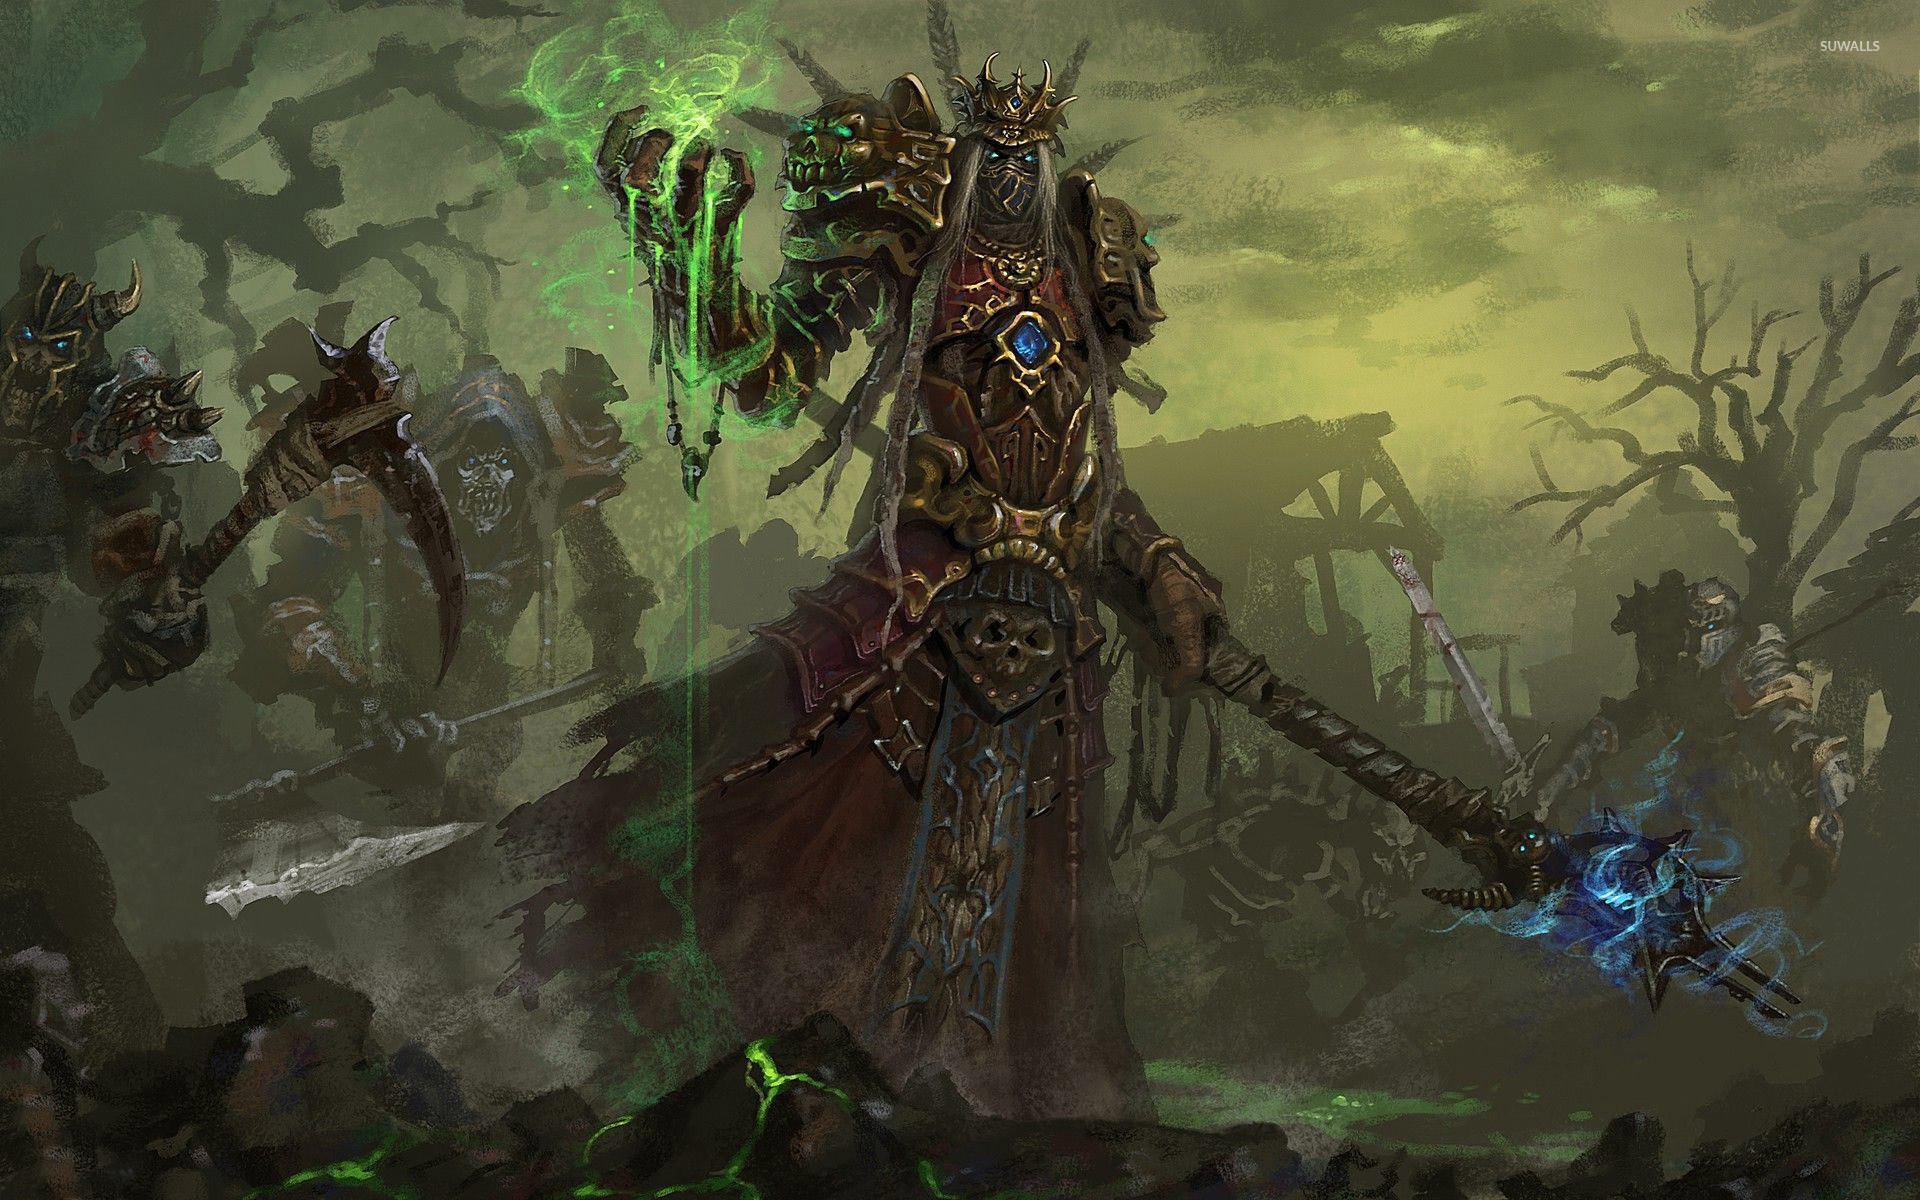 Res: 1920x1200, Undead warlock - World of Warcraft wallpaper